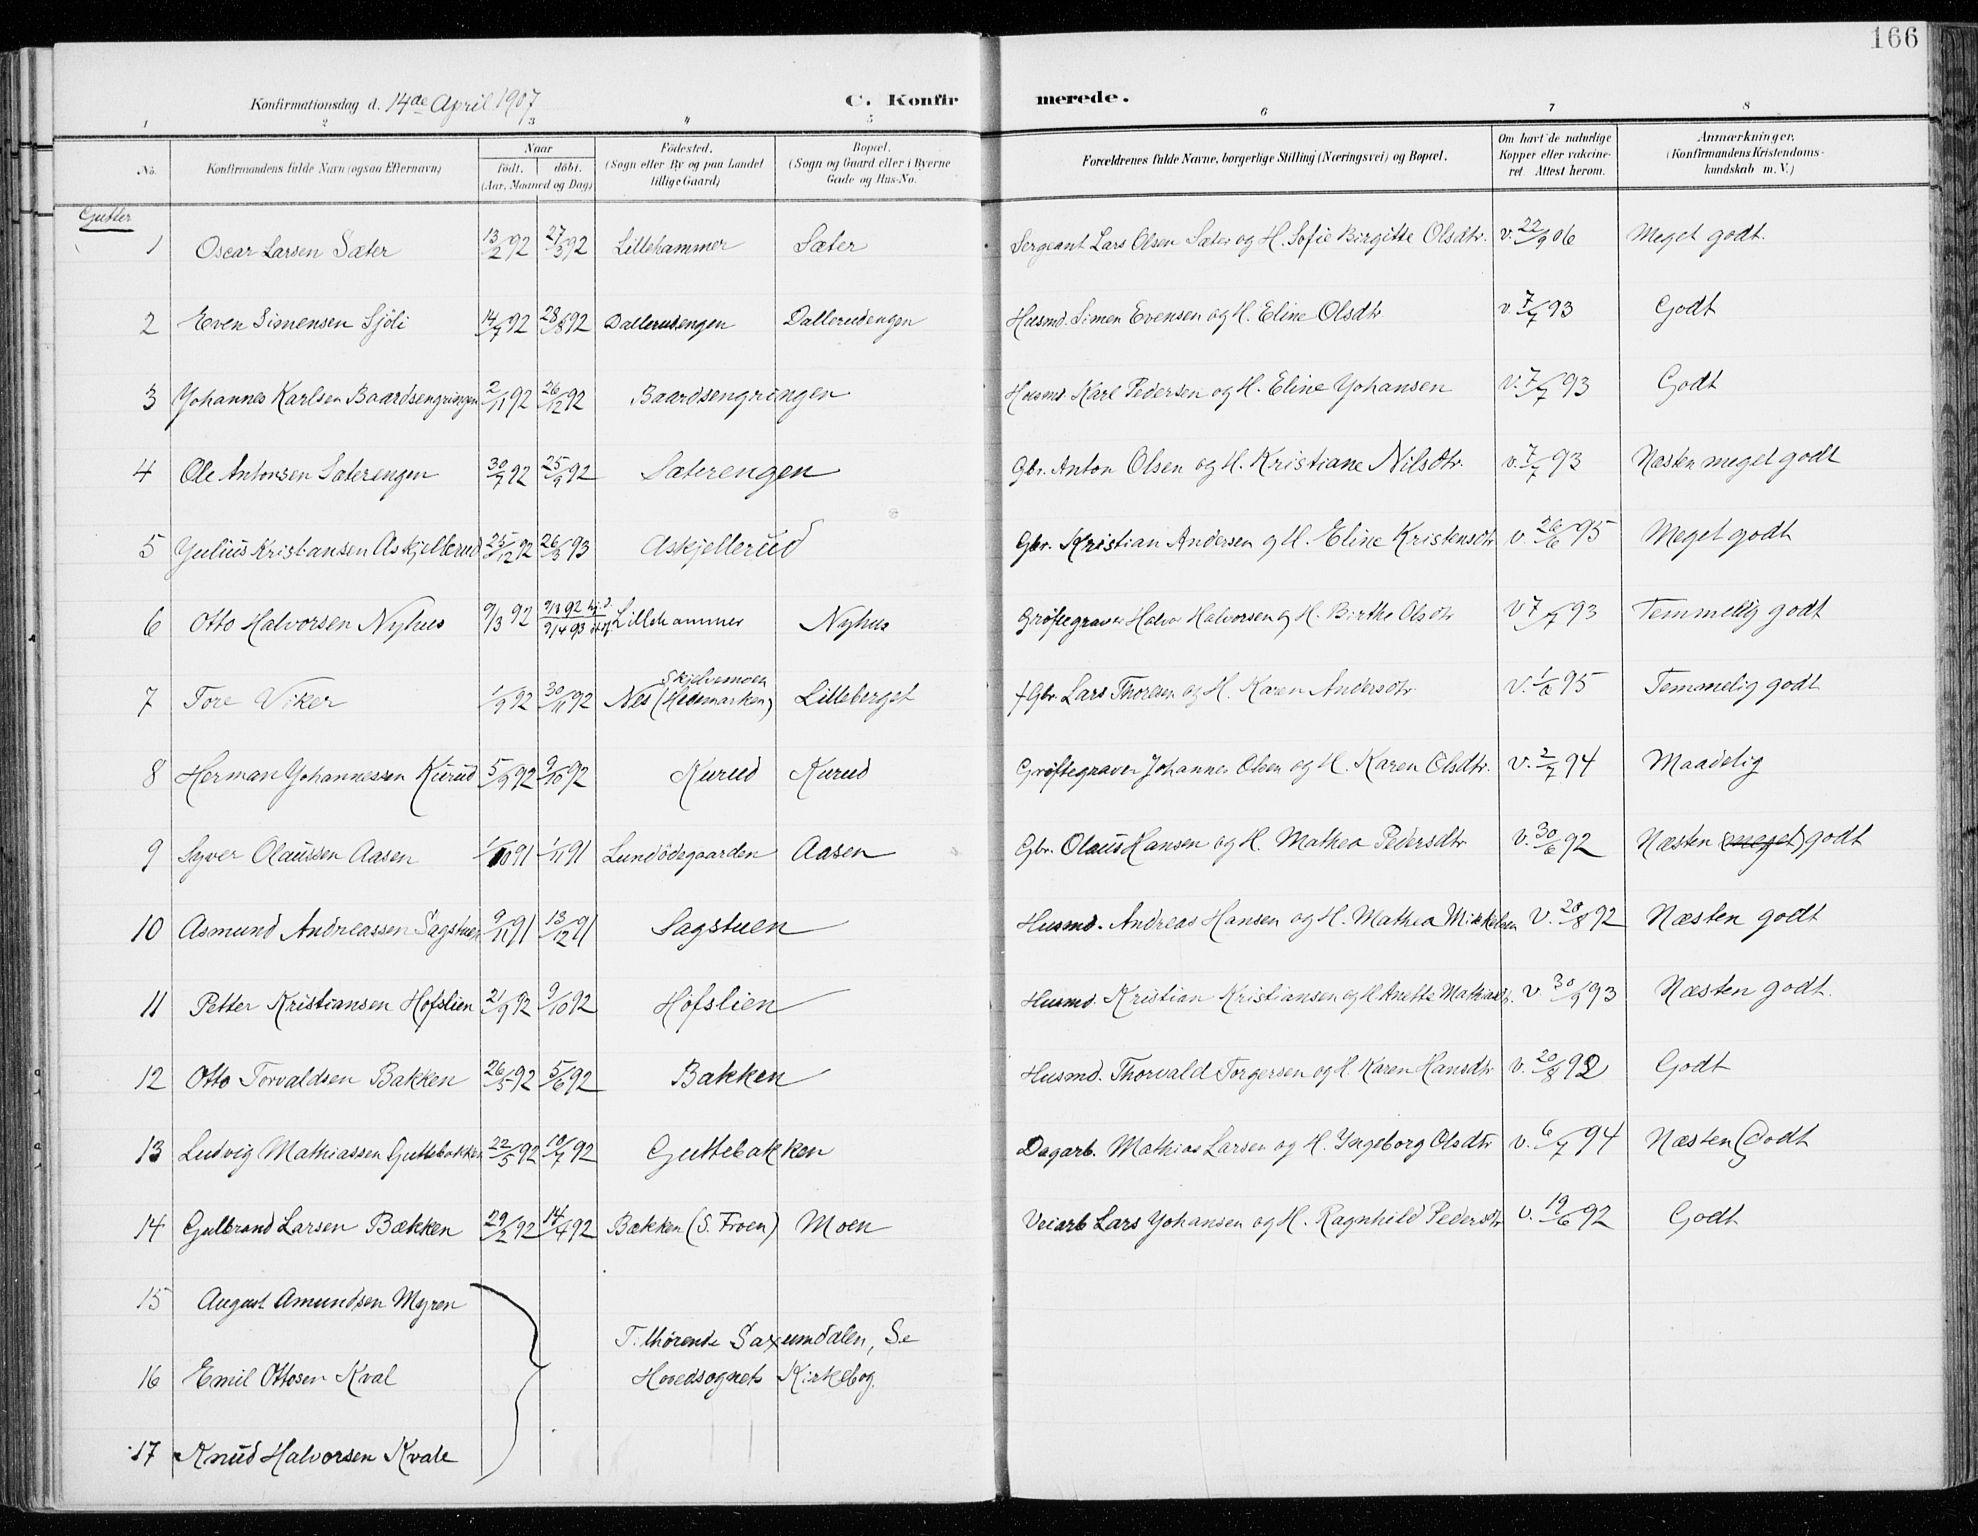 SAH, Fåberg prestekontor, H/Ha/Haa/L0011: Ministerialbok nr. 11, 1899-1913, s. 166